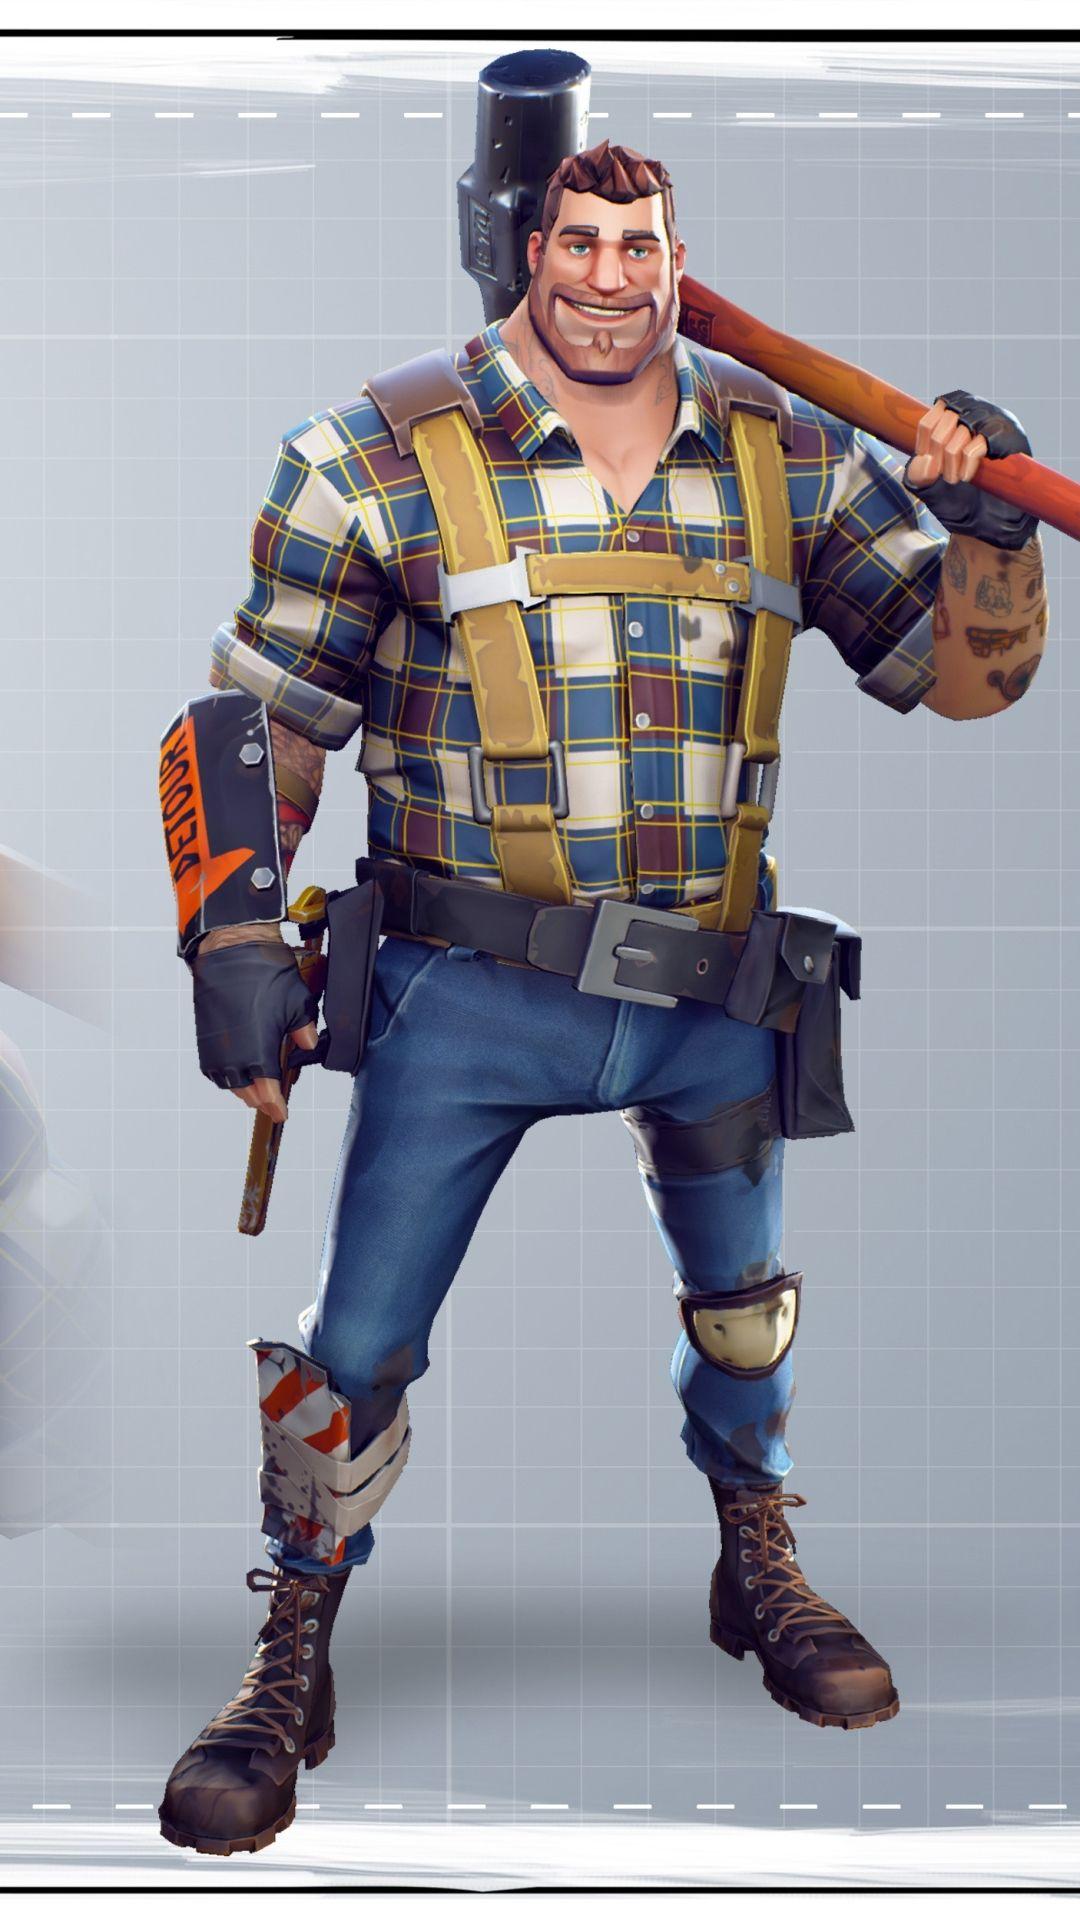 fortnite constructor - fortnite best constructor